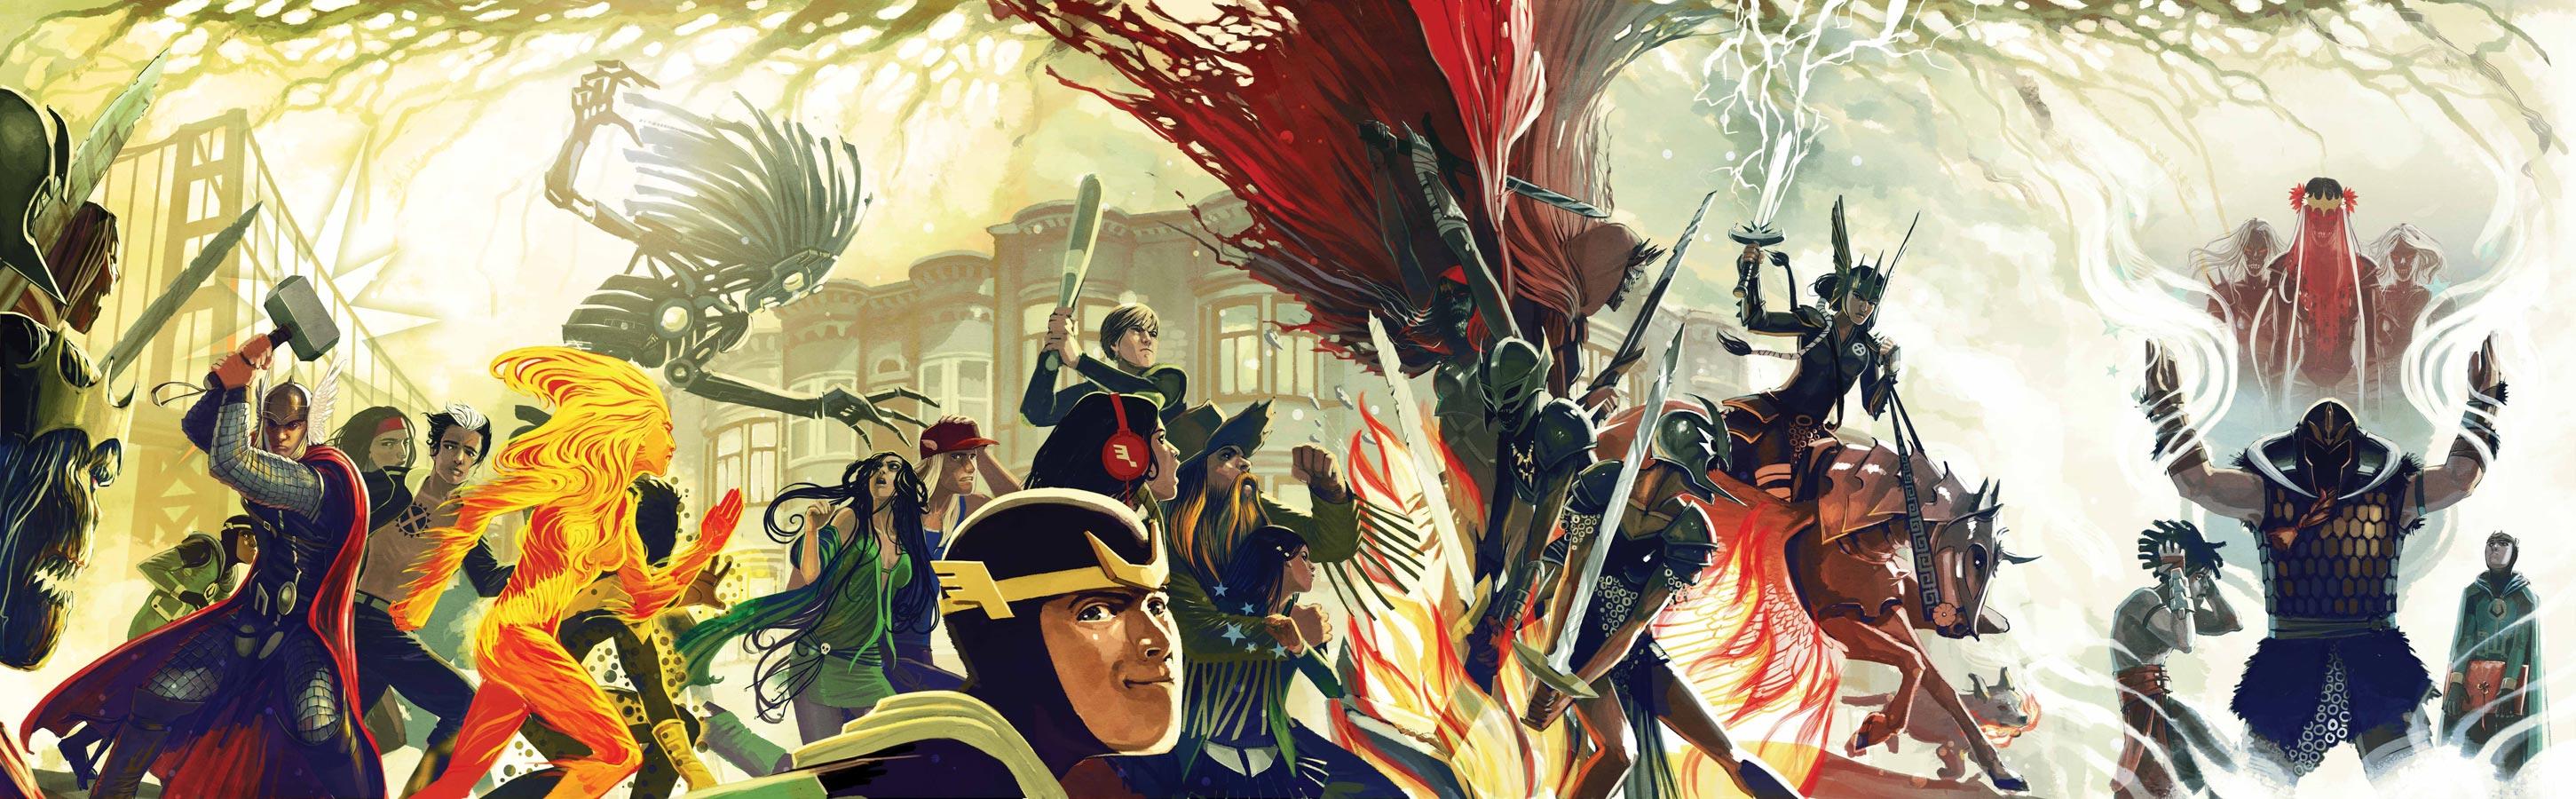 Exiled #1 (Marvel) Cover - Artist: Stephanie Hans